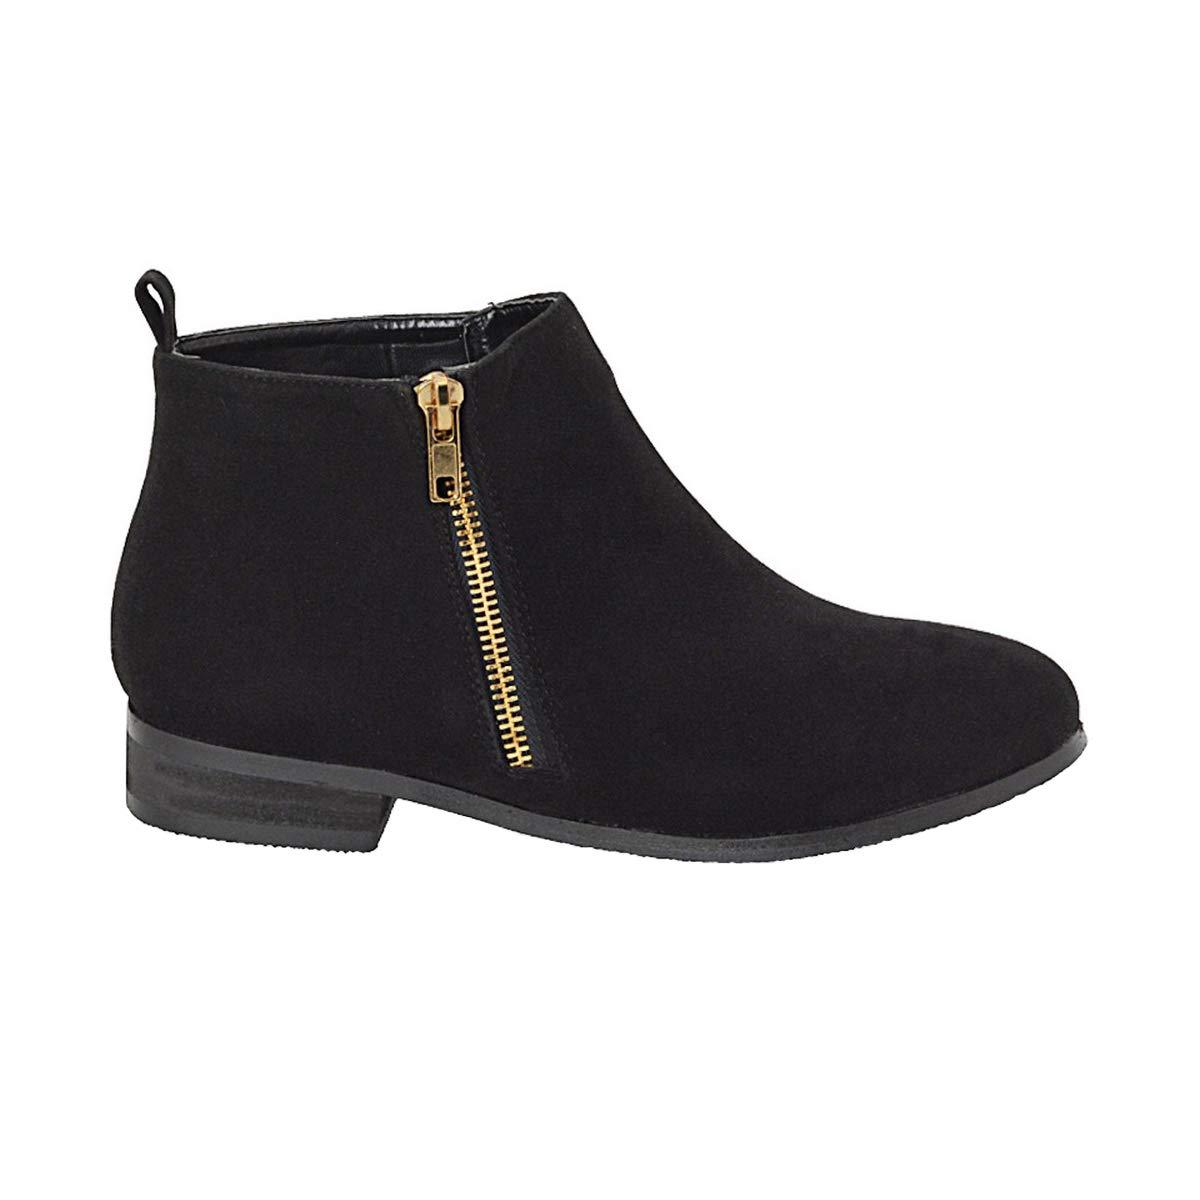 208878911c7ac ESSEX GLAM Ladies Chelsea Block Heel Riding Biker Gold Zip Womens Flat  Ankle Boots Shoes Size 3-8